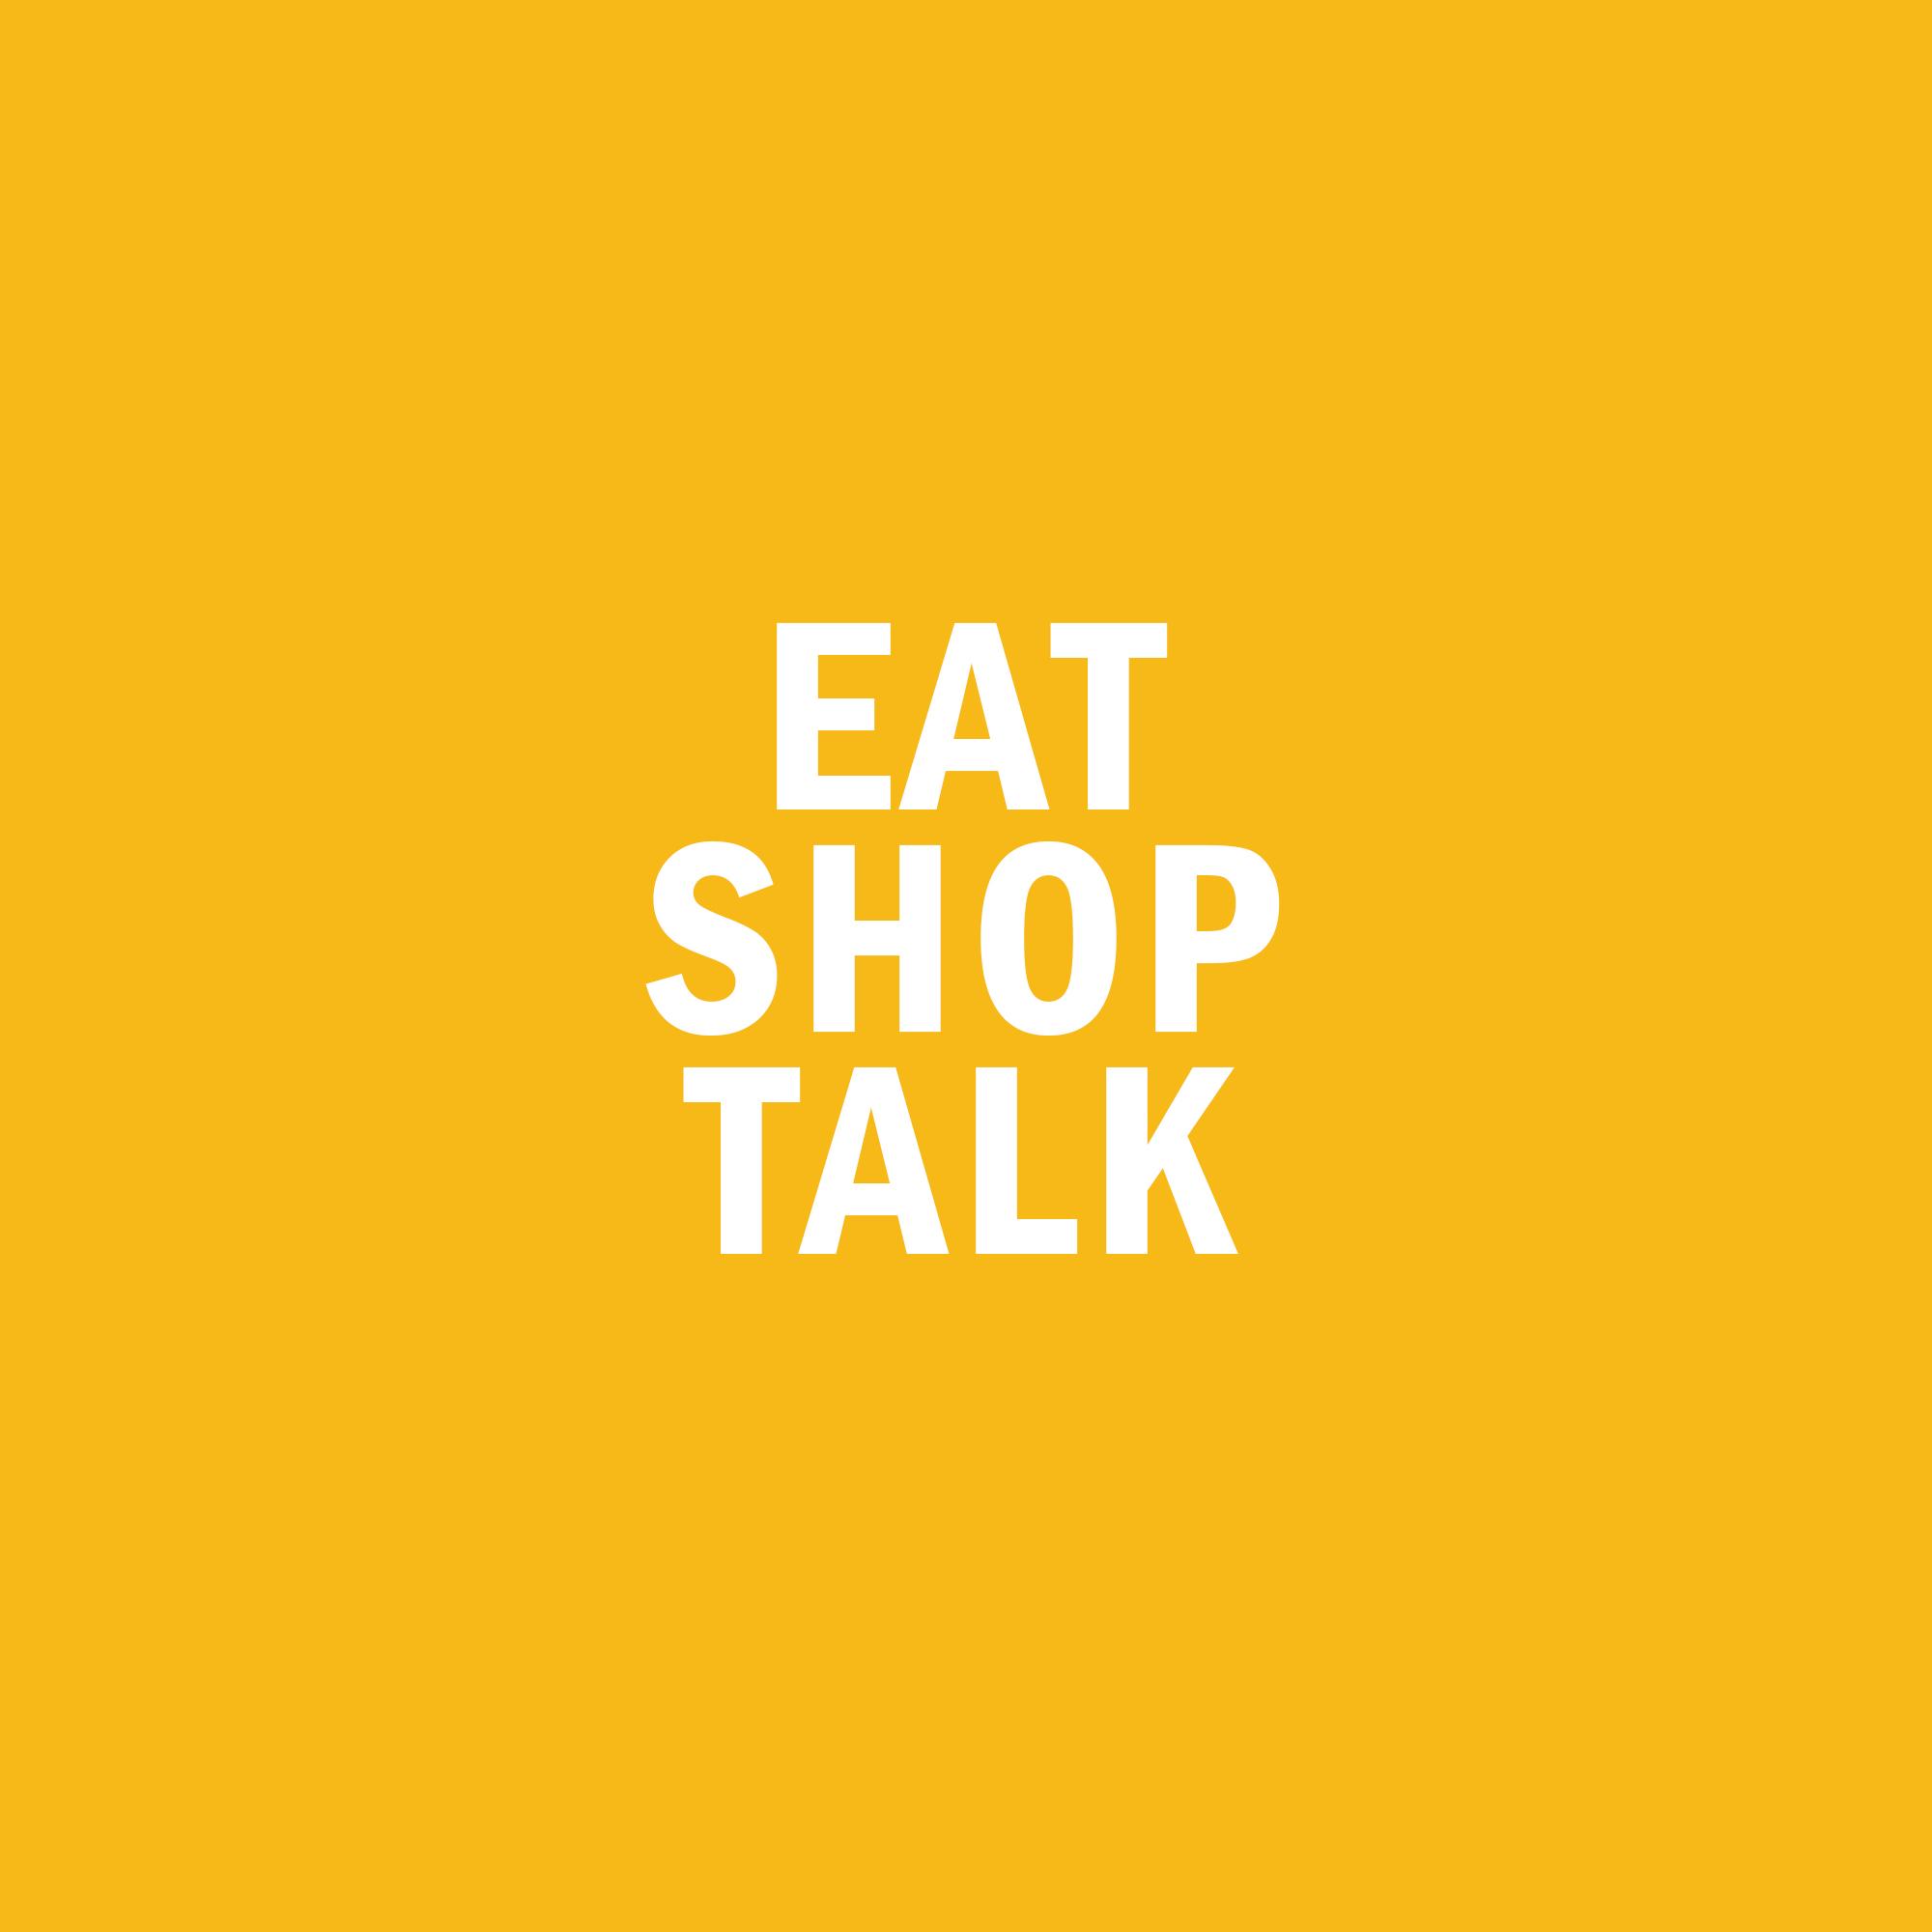 eat-shop-talk.jpg